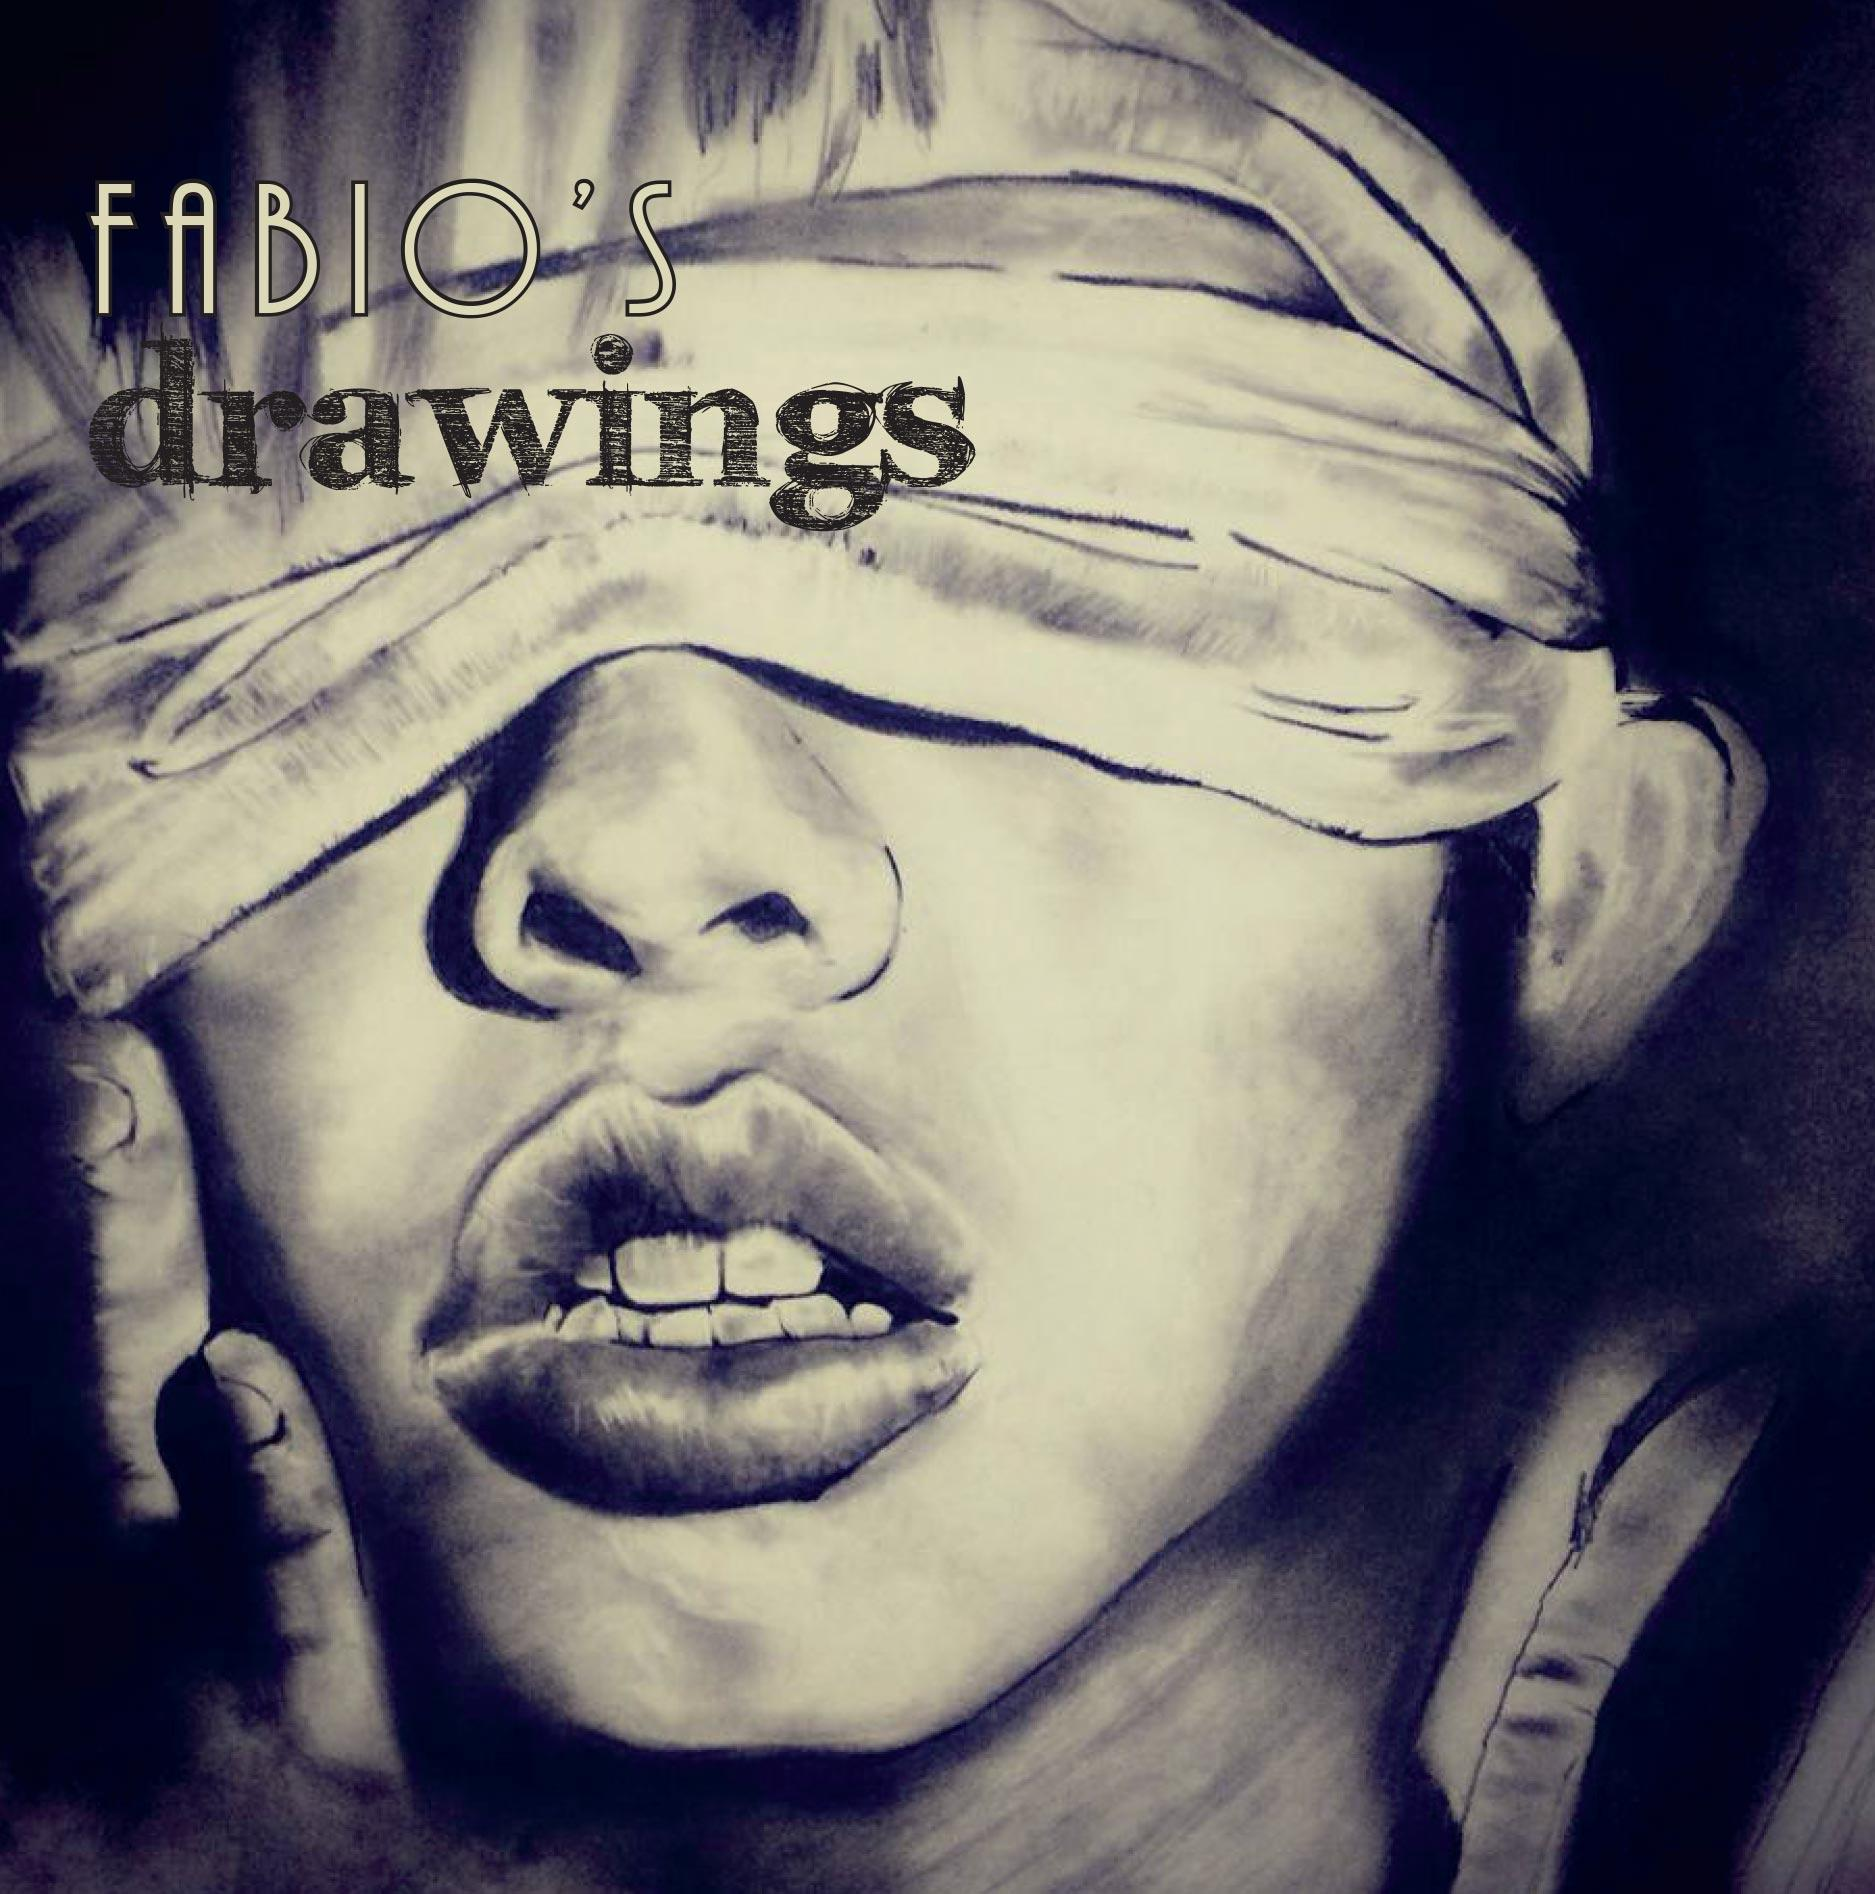 Fabio's Drawings